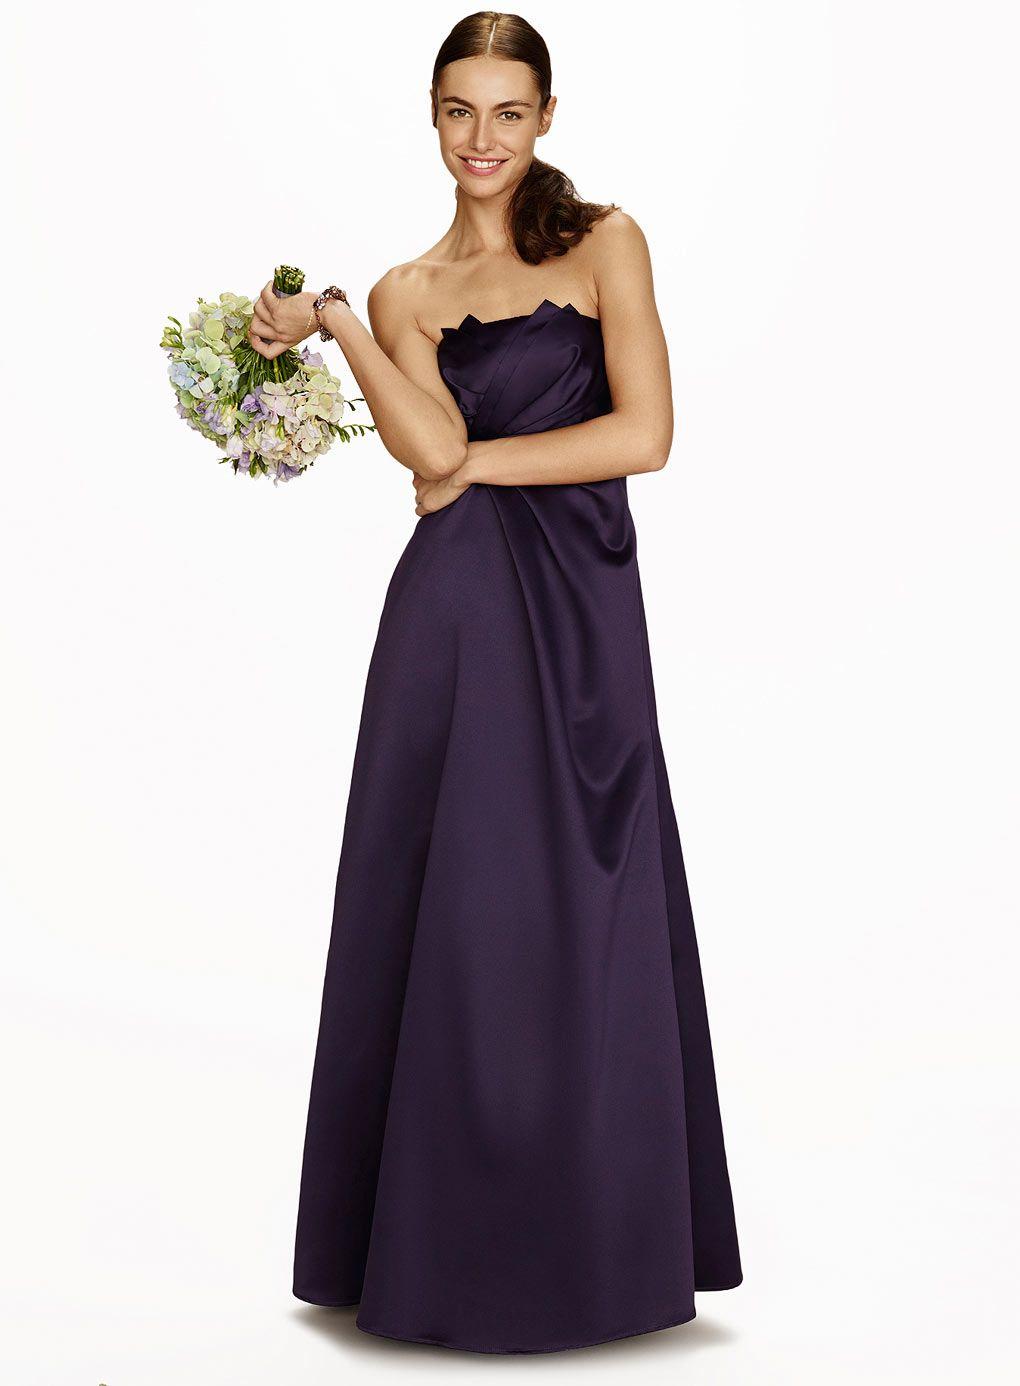 Iris grape long dress httpweddingheartbhs adult iris grape long dress httpweddingheart dark purple bridesmaid dressesbridesmaid ombrellifo Image collections